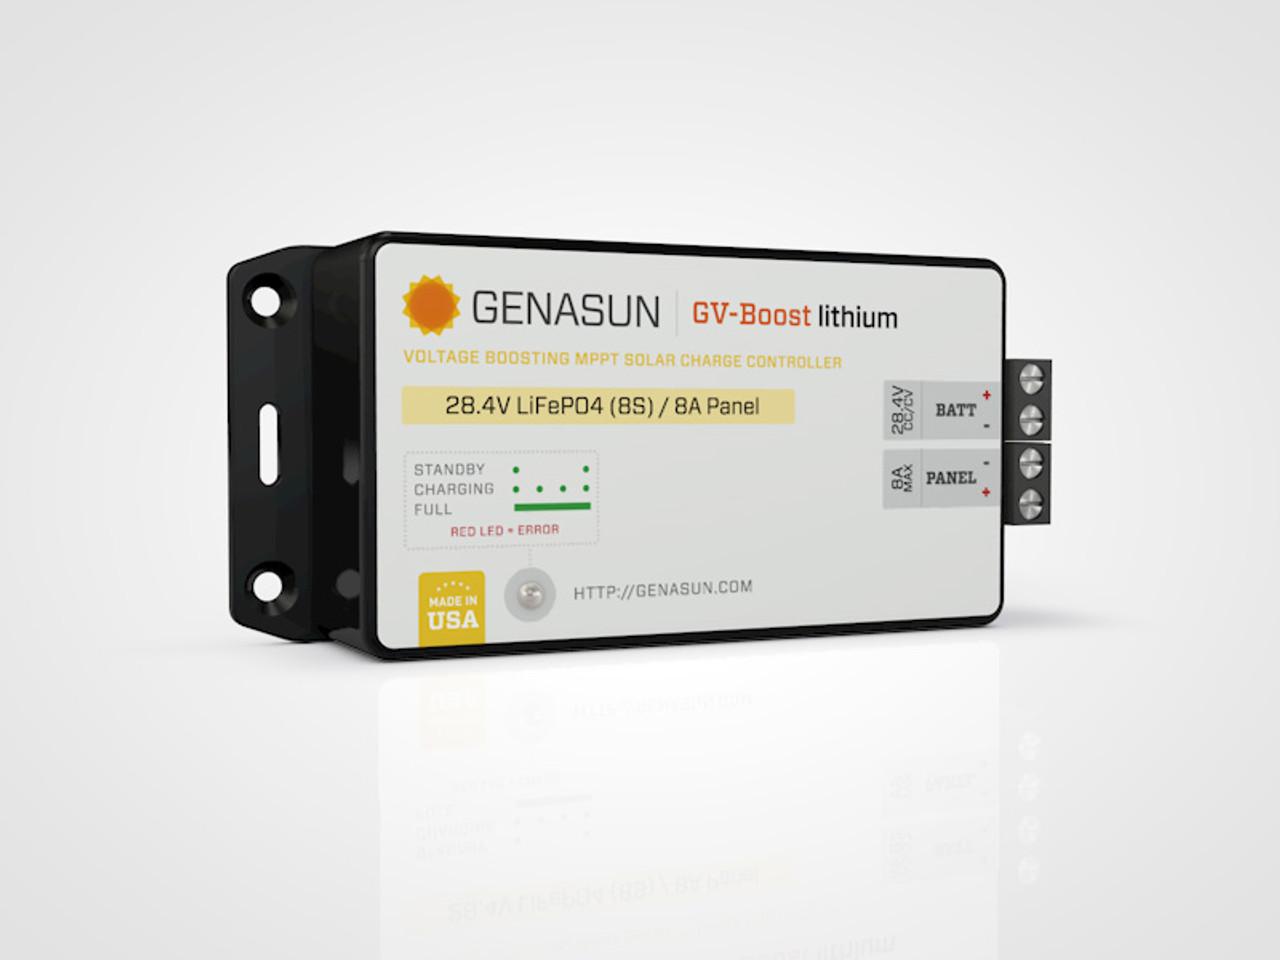 GVB-8 | 105W 8A 12V Genasun MPPT Boost Solar Charge Controller - Li - Left1